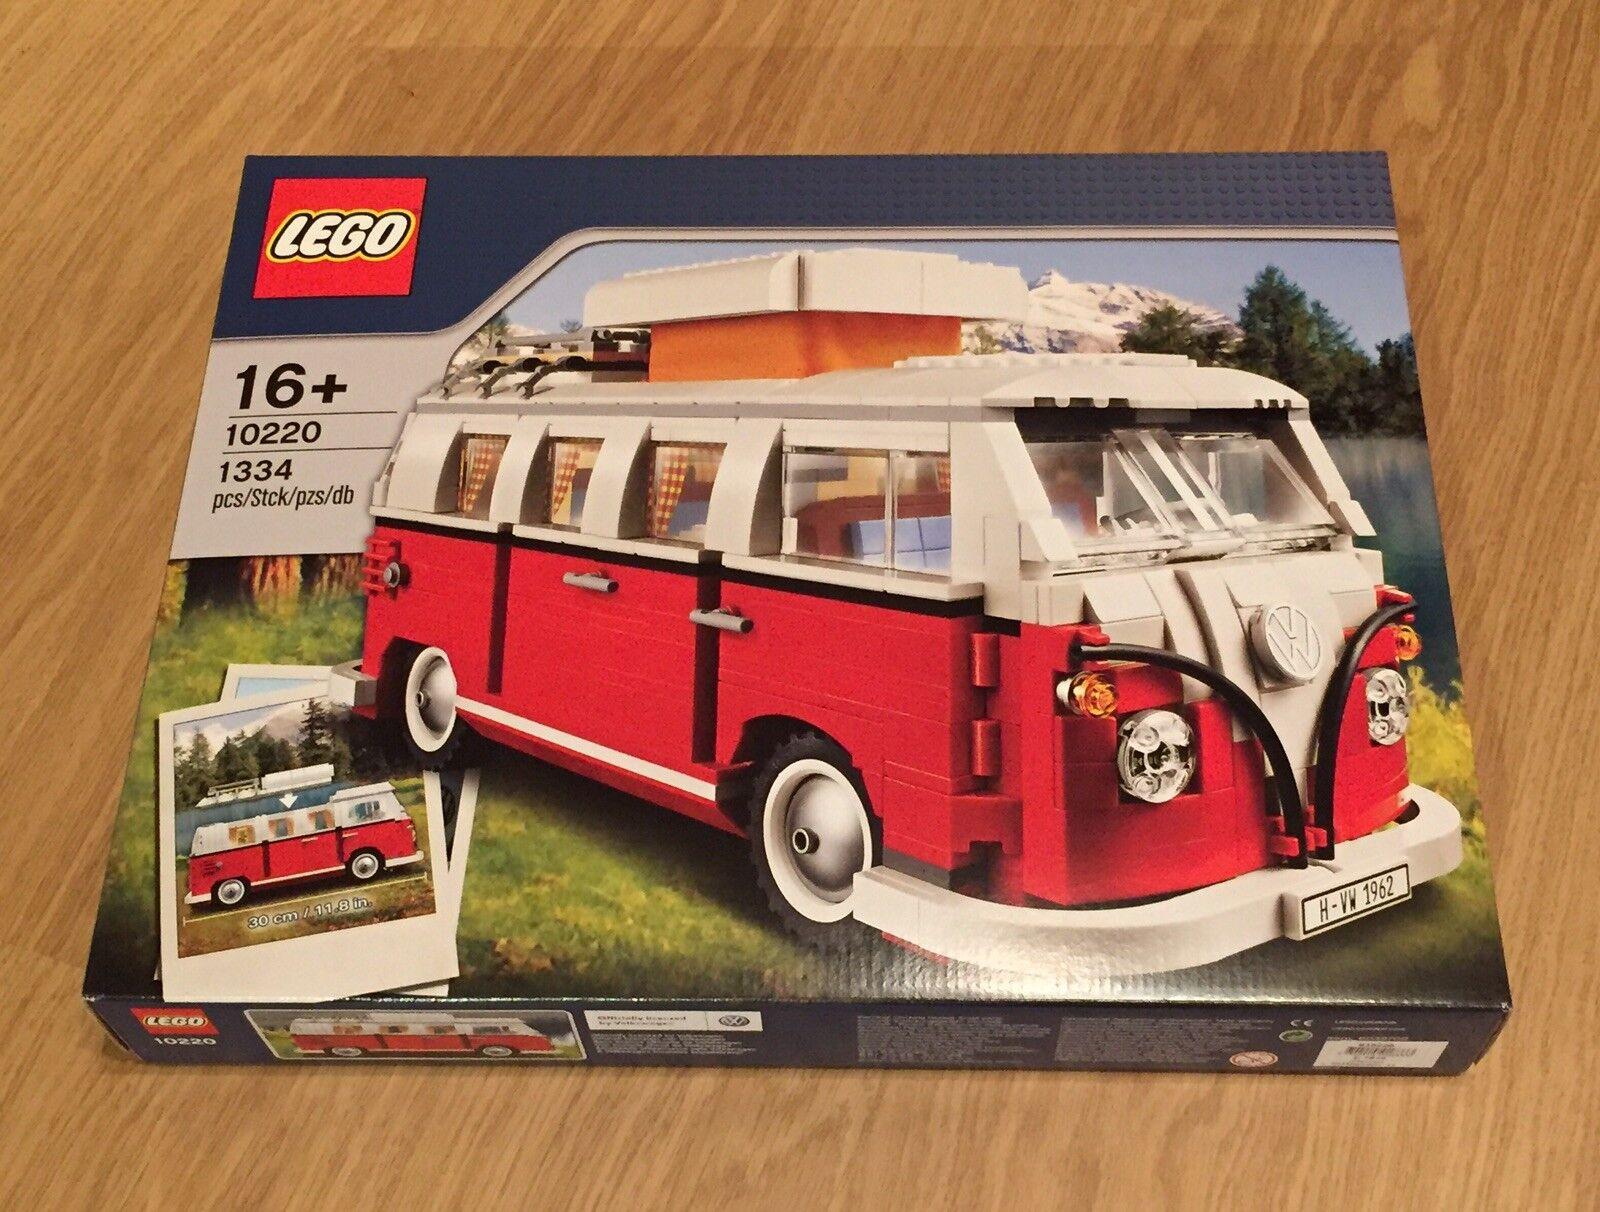 LEGO 10220 Advanced Models Volkswagen T1 Camper Van. Brand New. Sealed box.